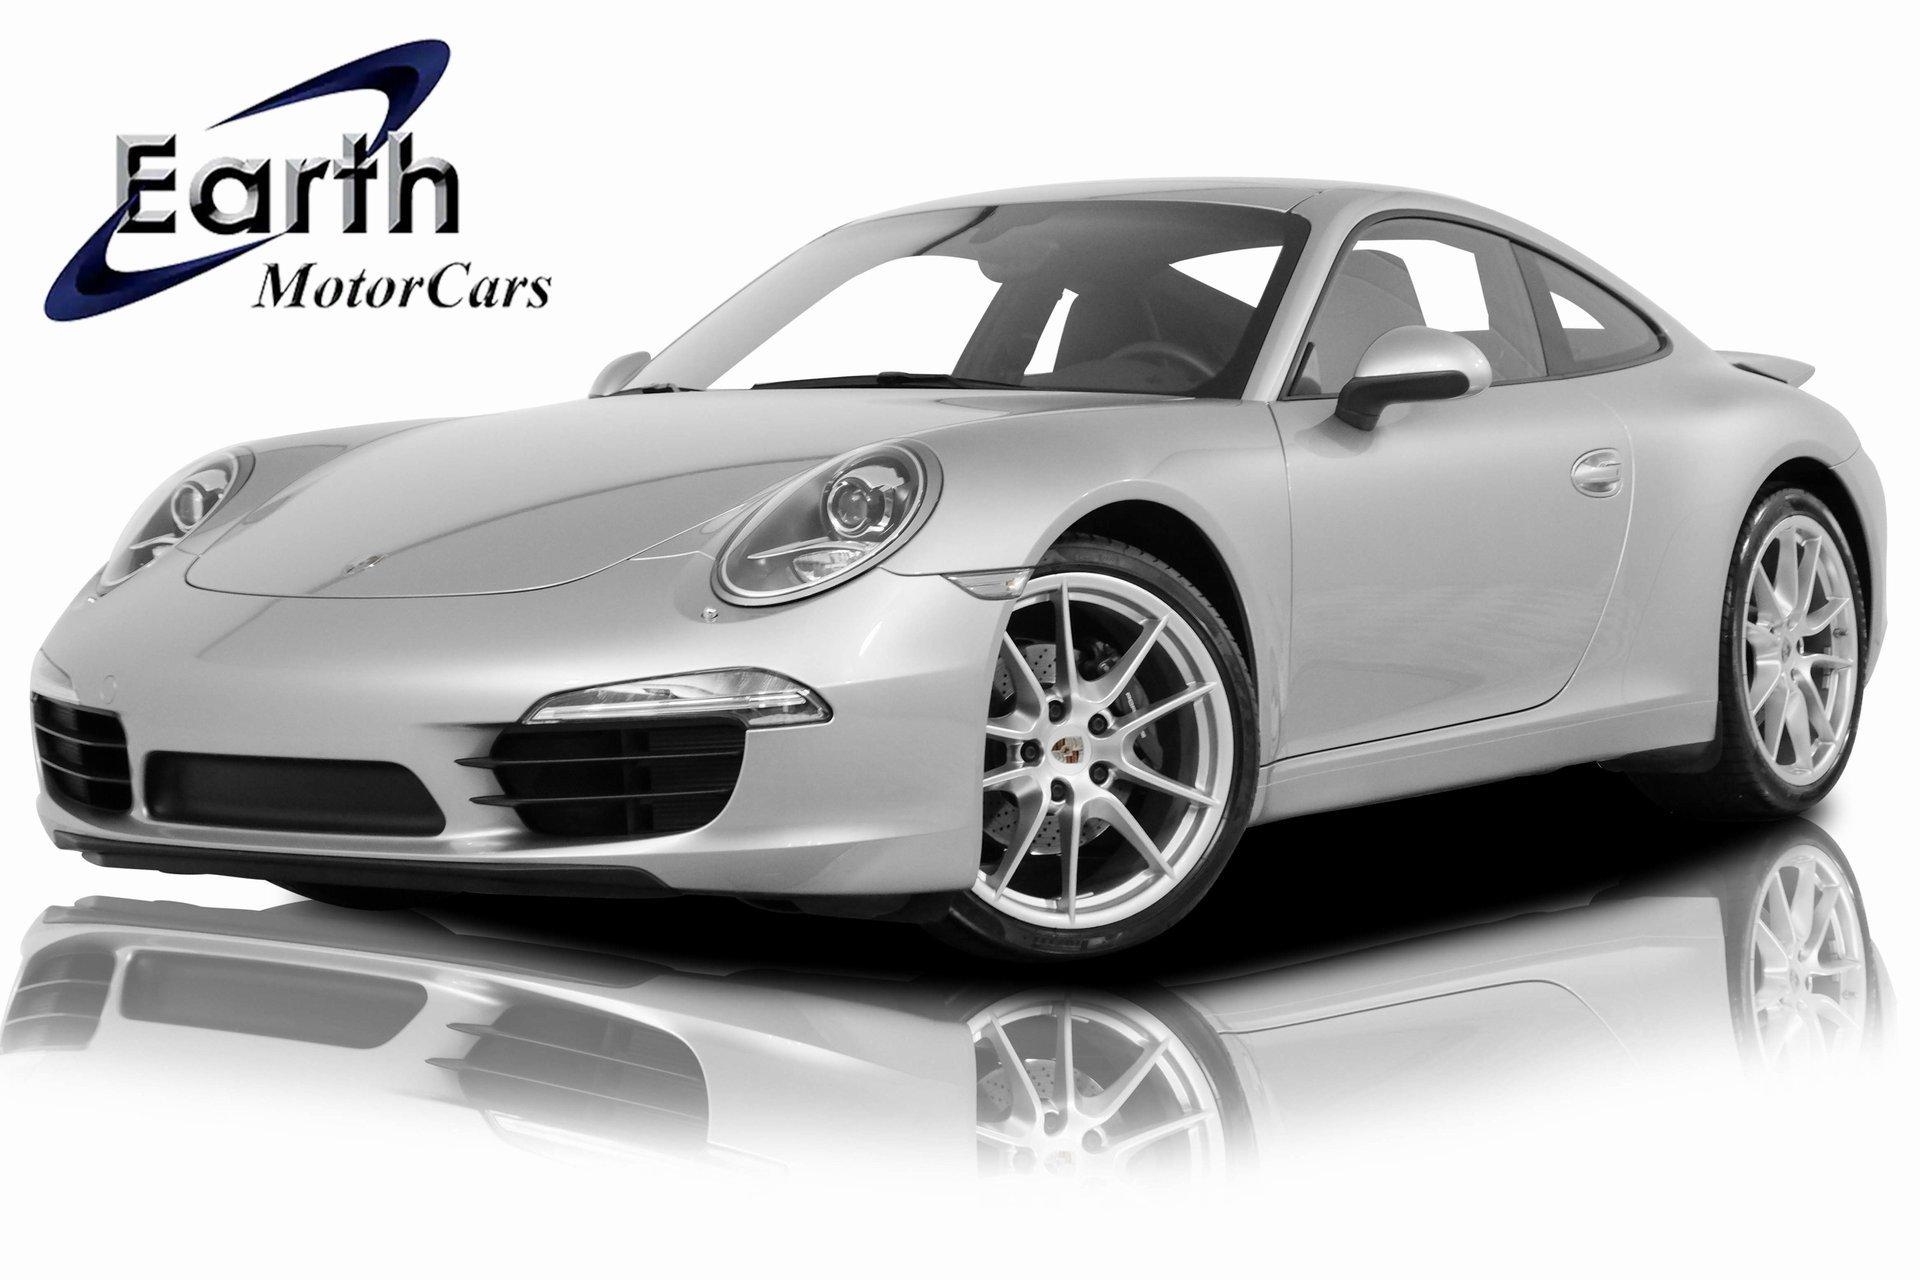 2013 Porsche 911 Carrera image